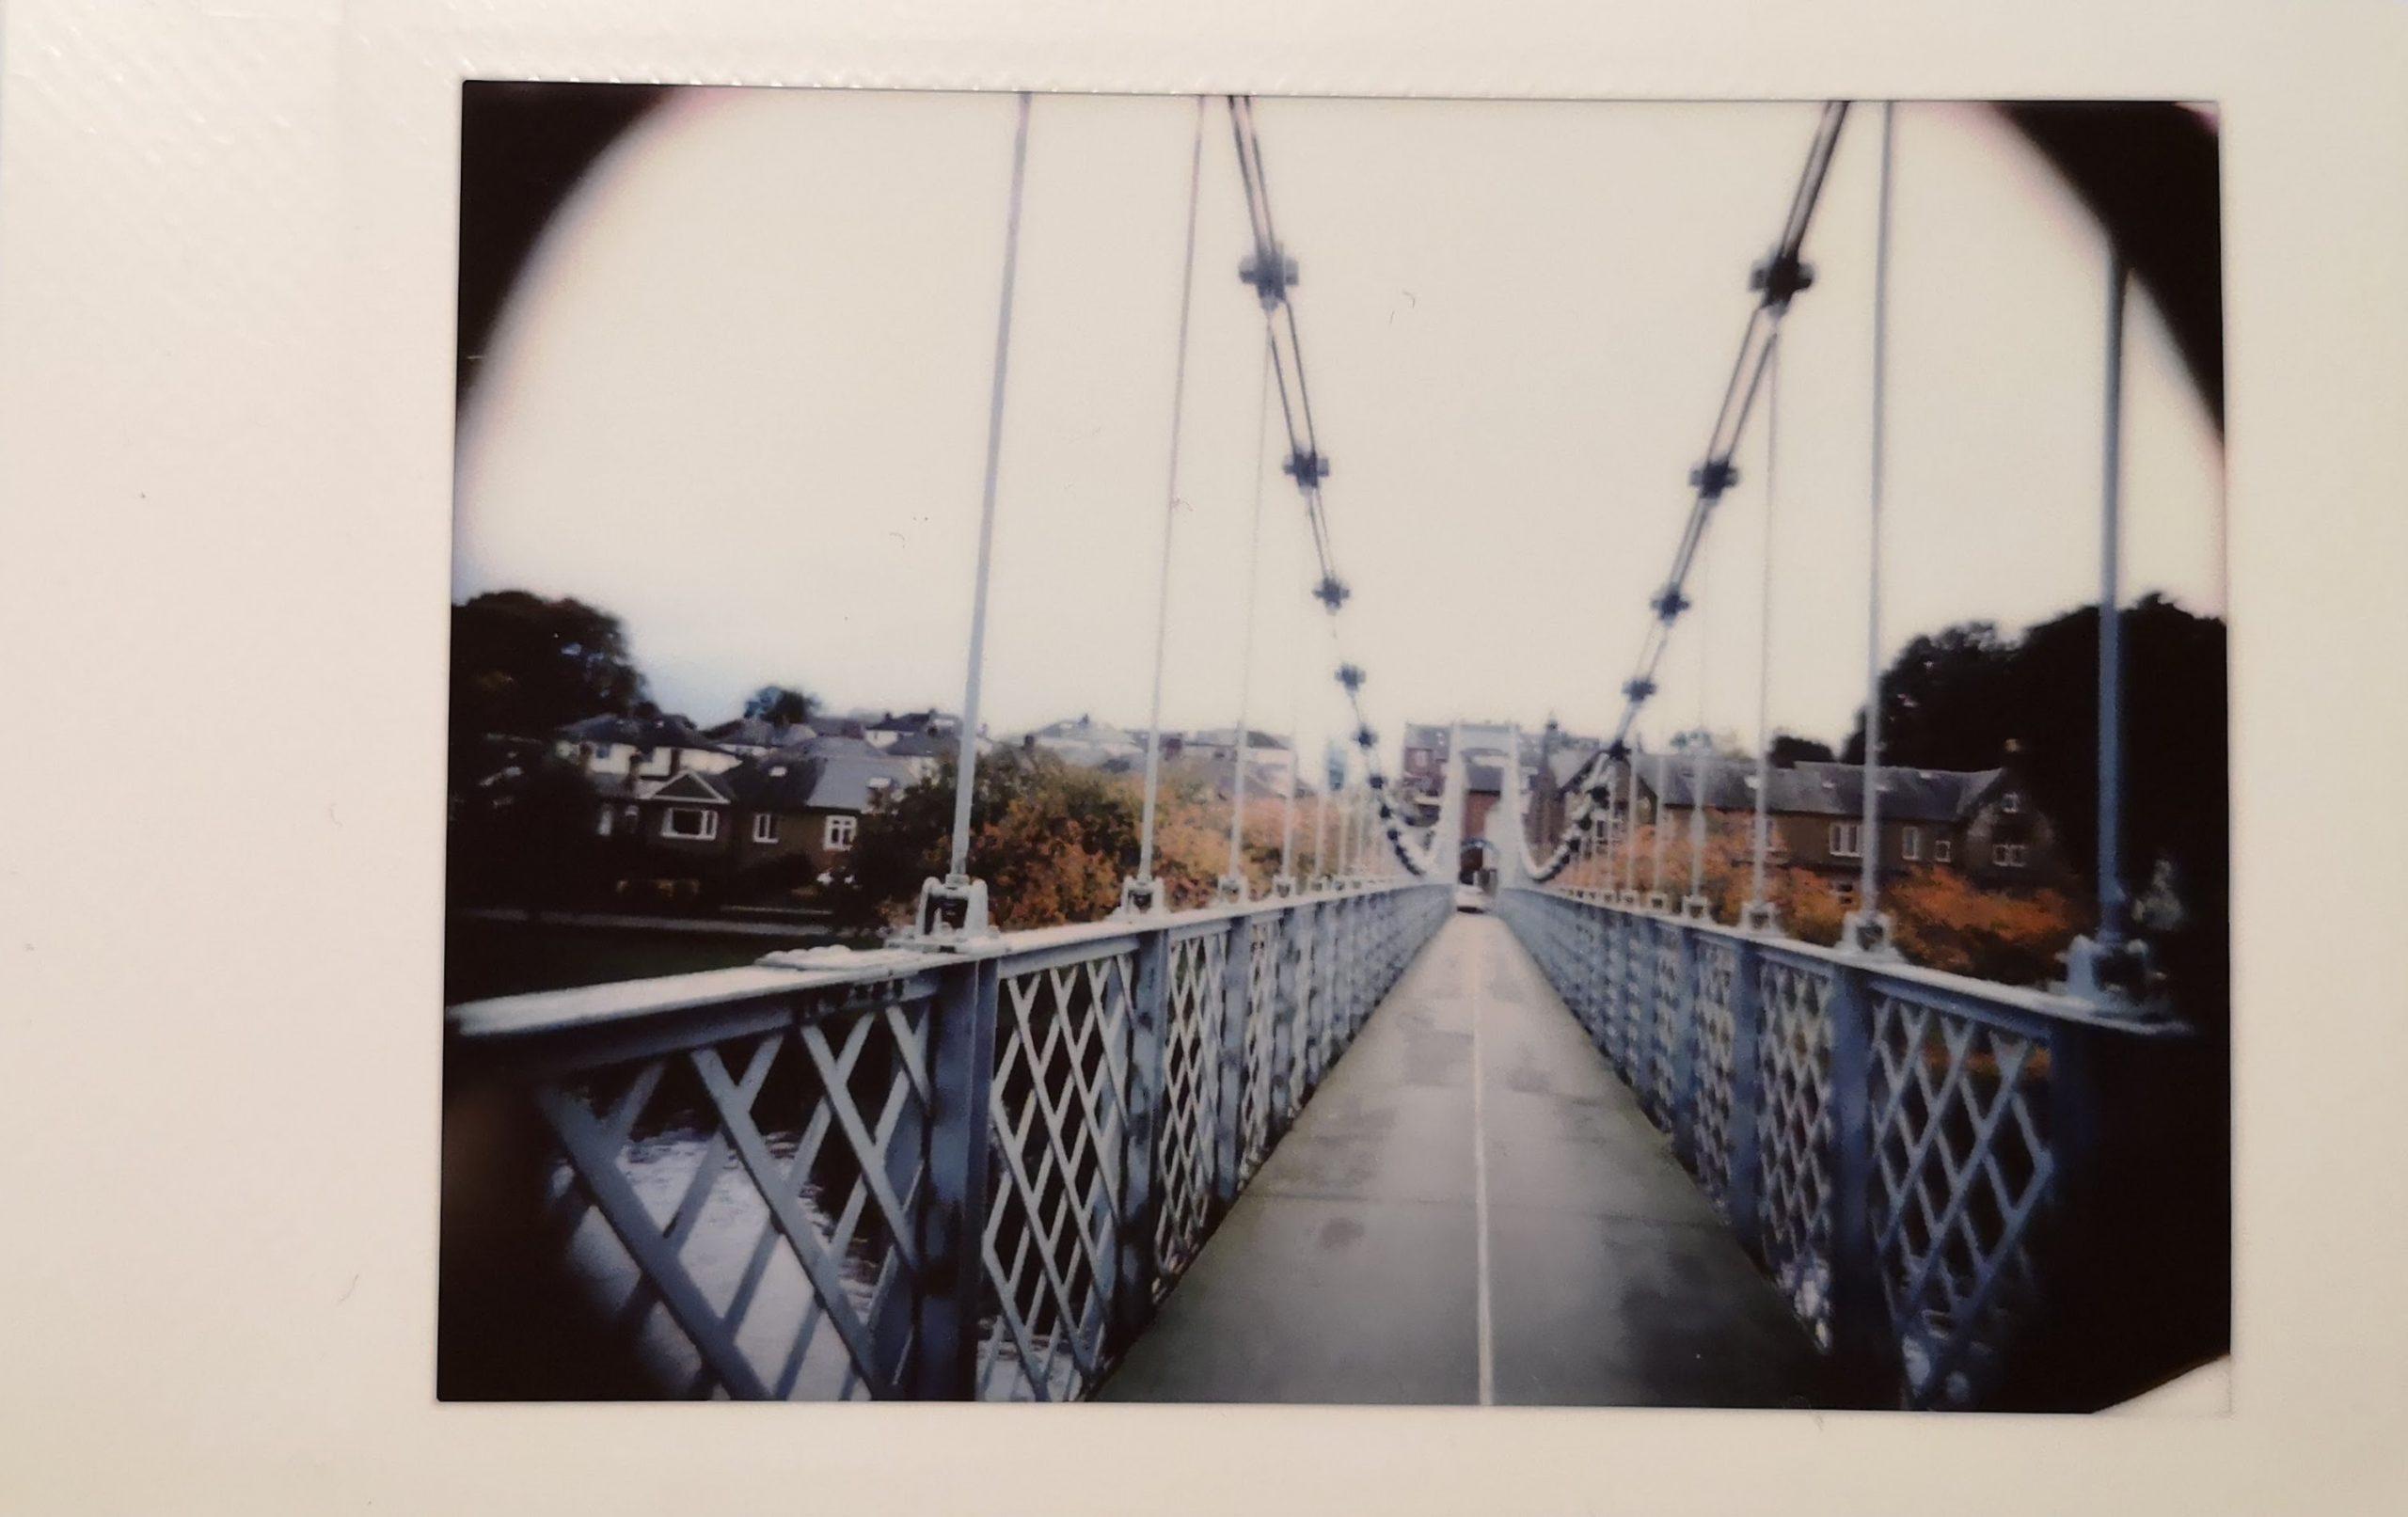 Bridge. Taken on Nons SL42